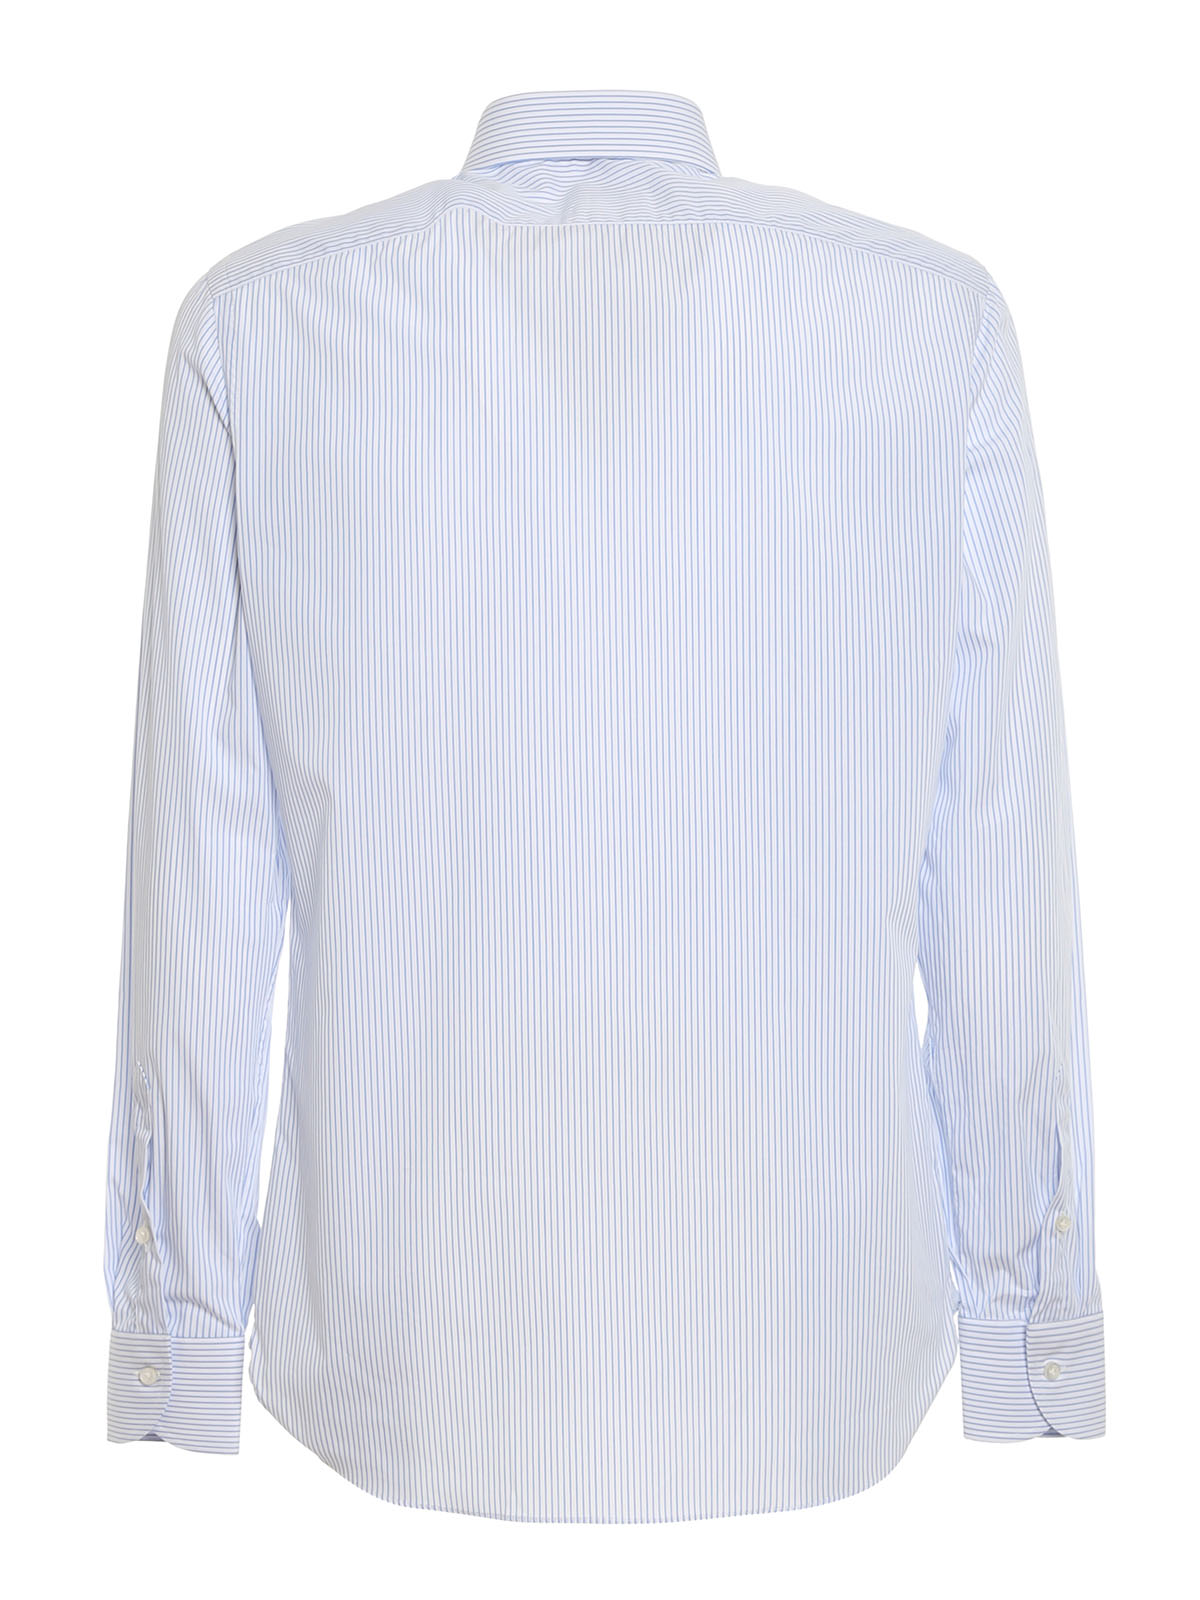 Picture of Borriello | Shirt